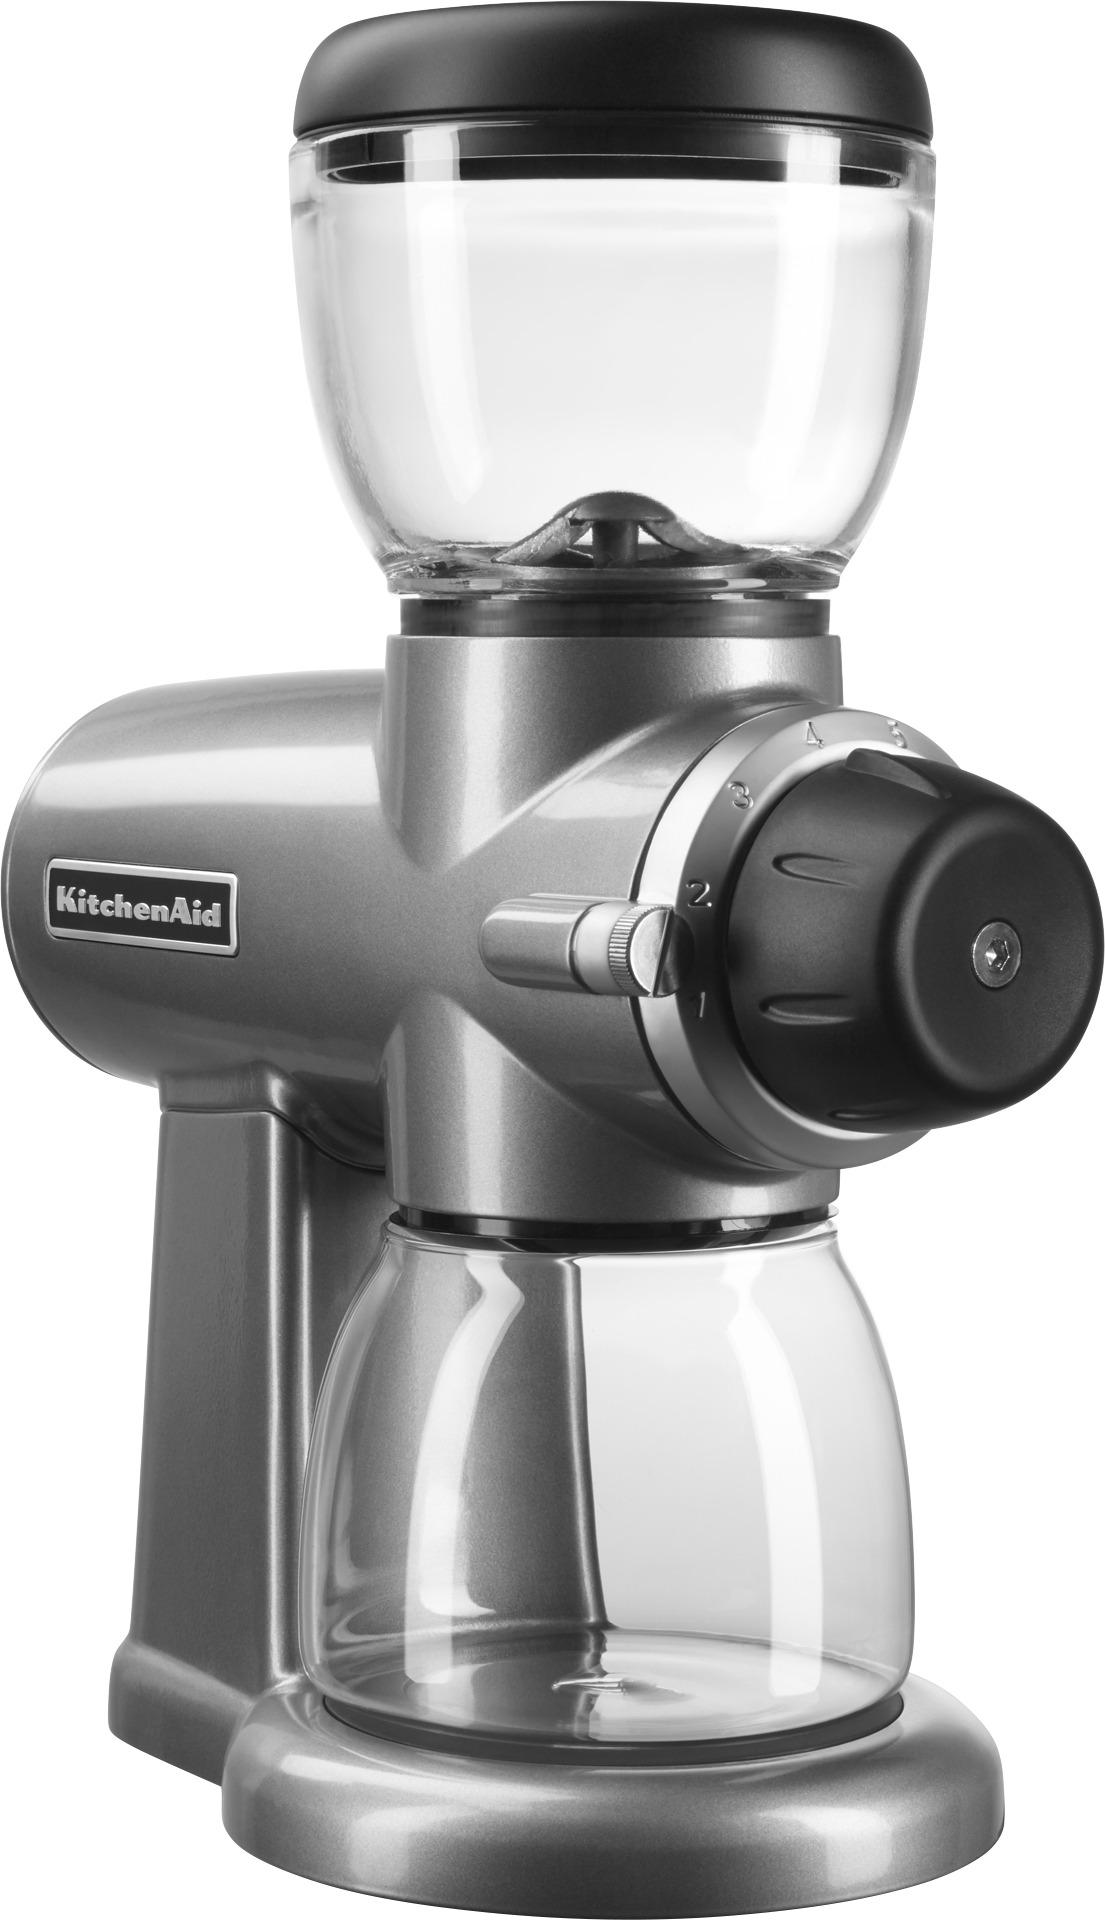 kitchen aid grinder stand alone cabinet kitchenaid 6 4 oz coffee multi kcg0702cu best buy contour silver front zoom